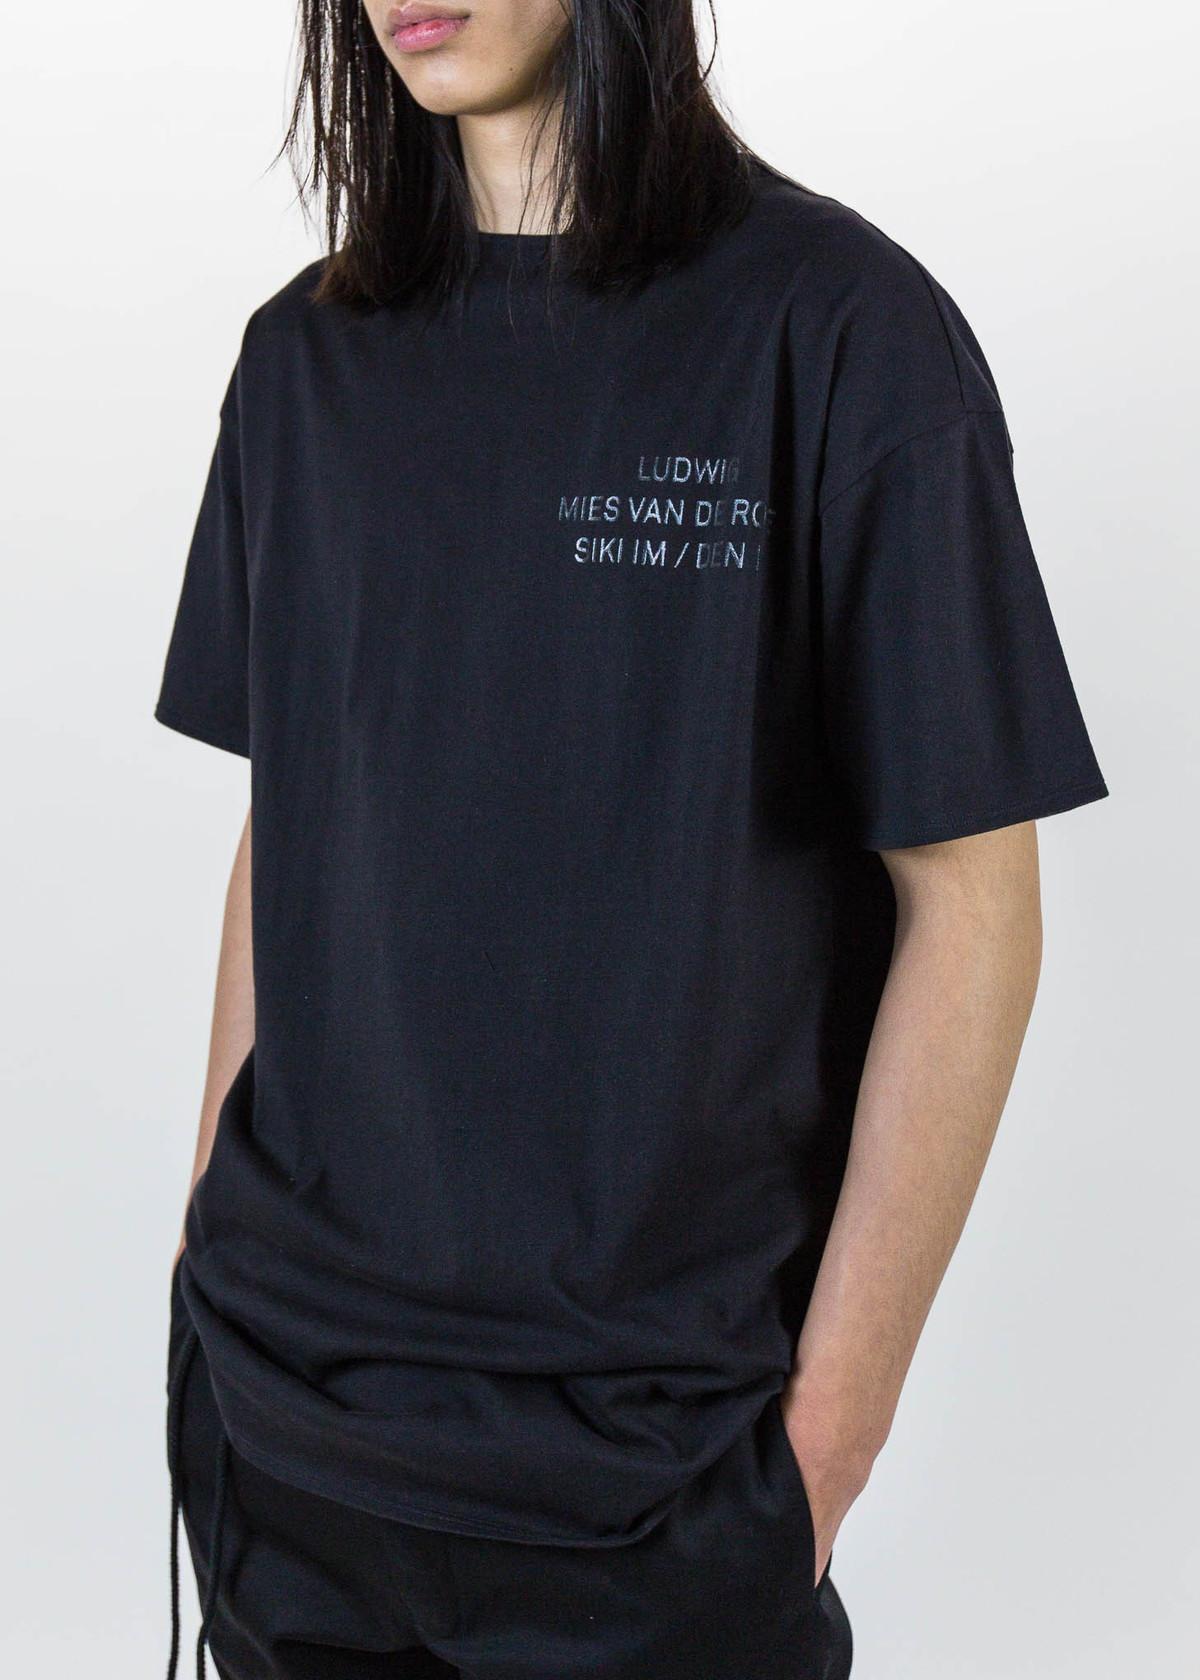 Im black t shirt - Sizes S M L